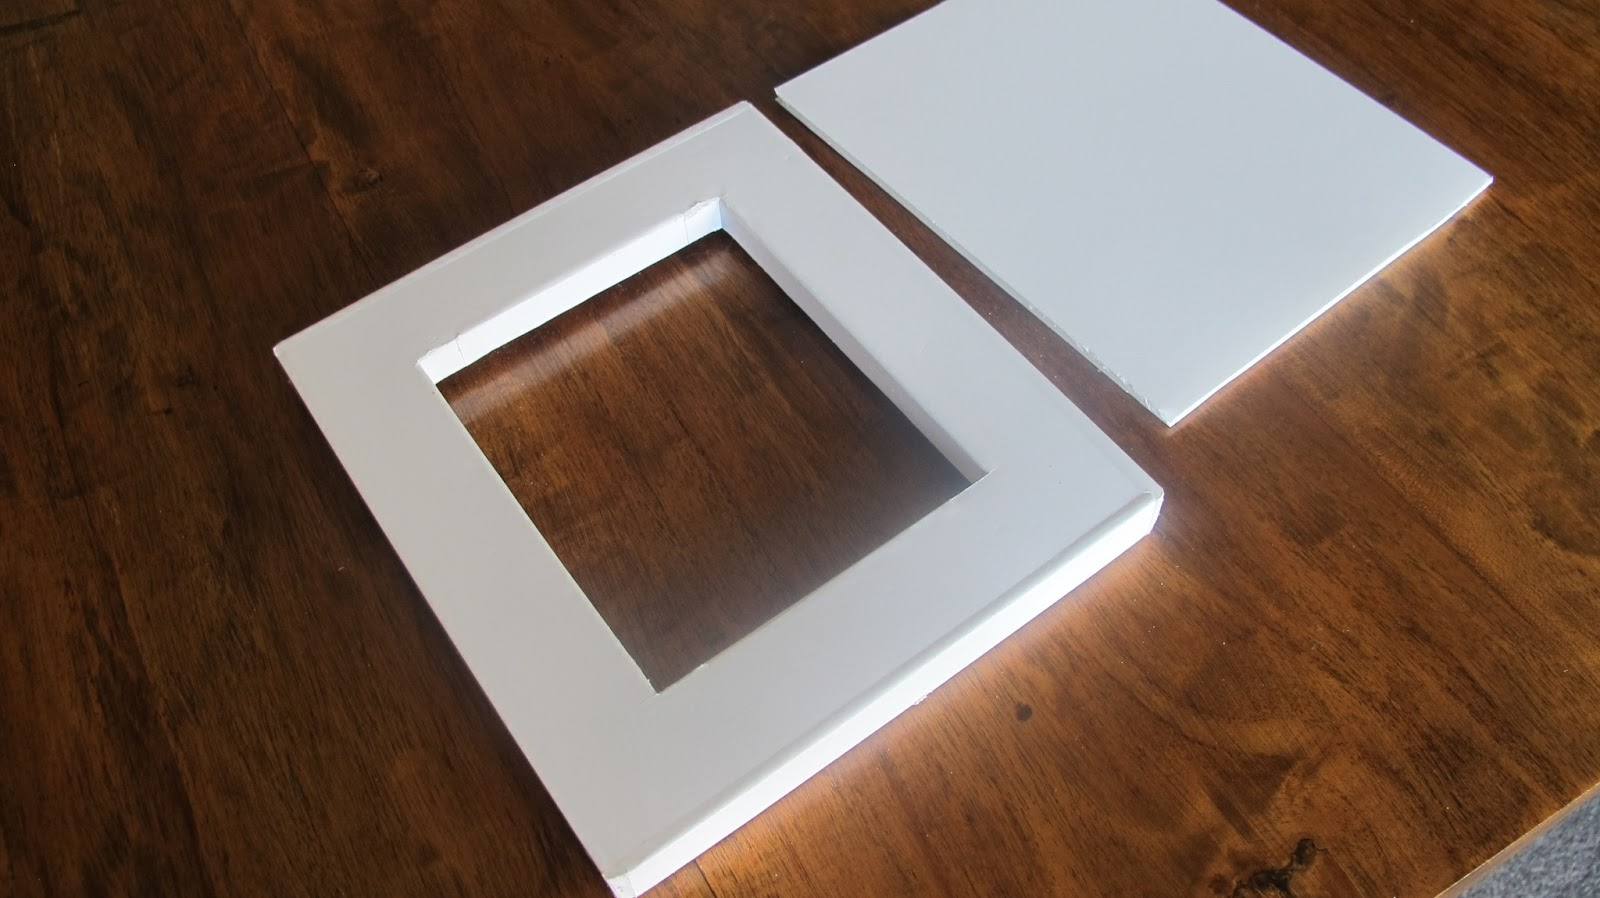 frame | PlanetArduino